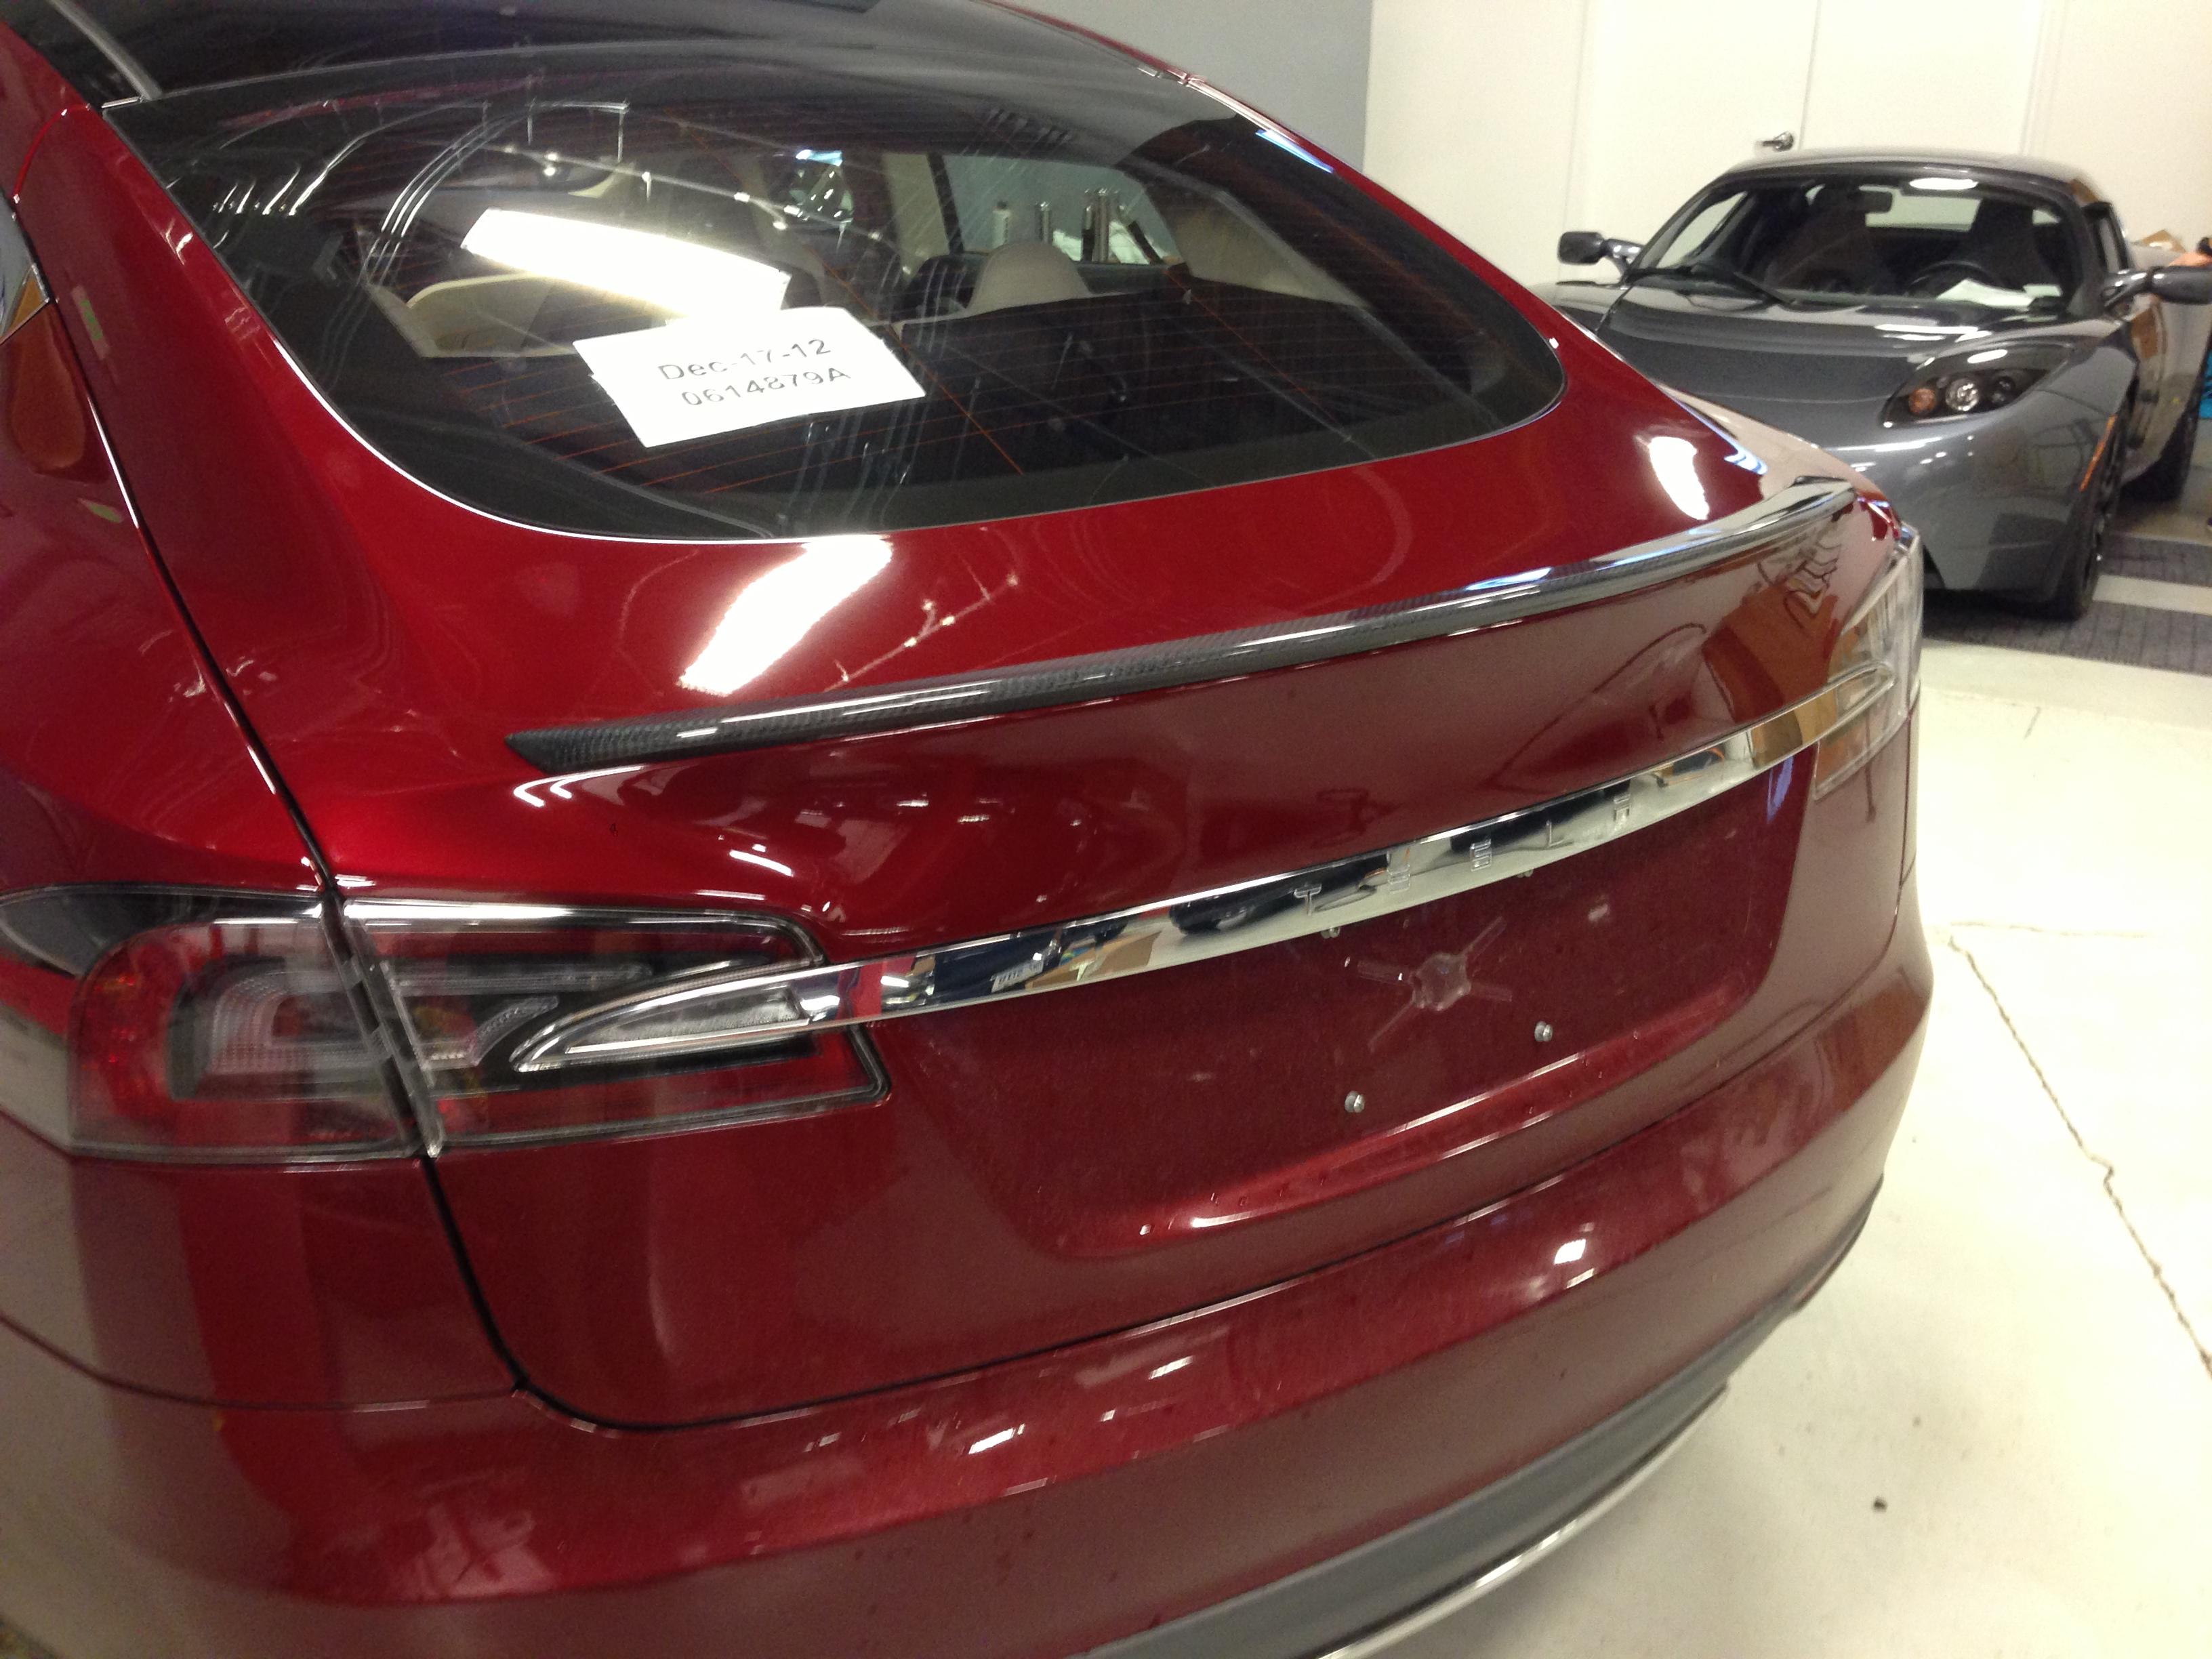 Debadged Model S.JPG